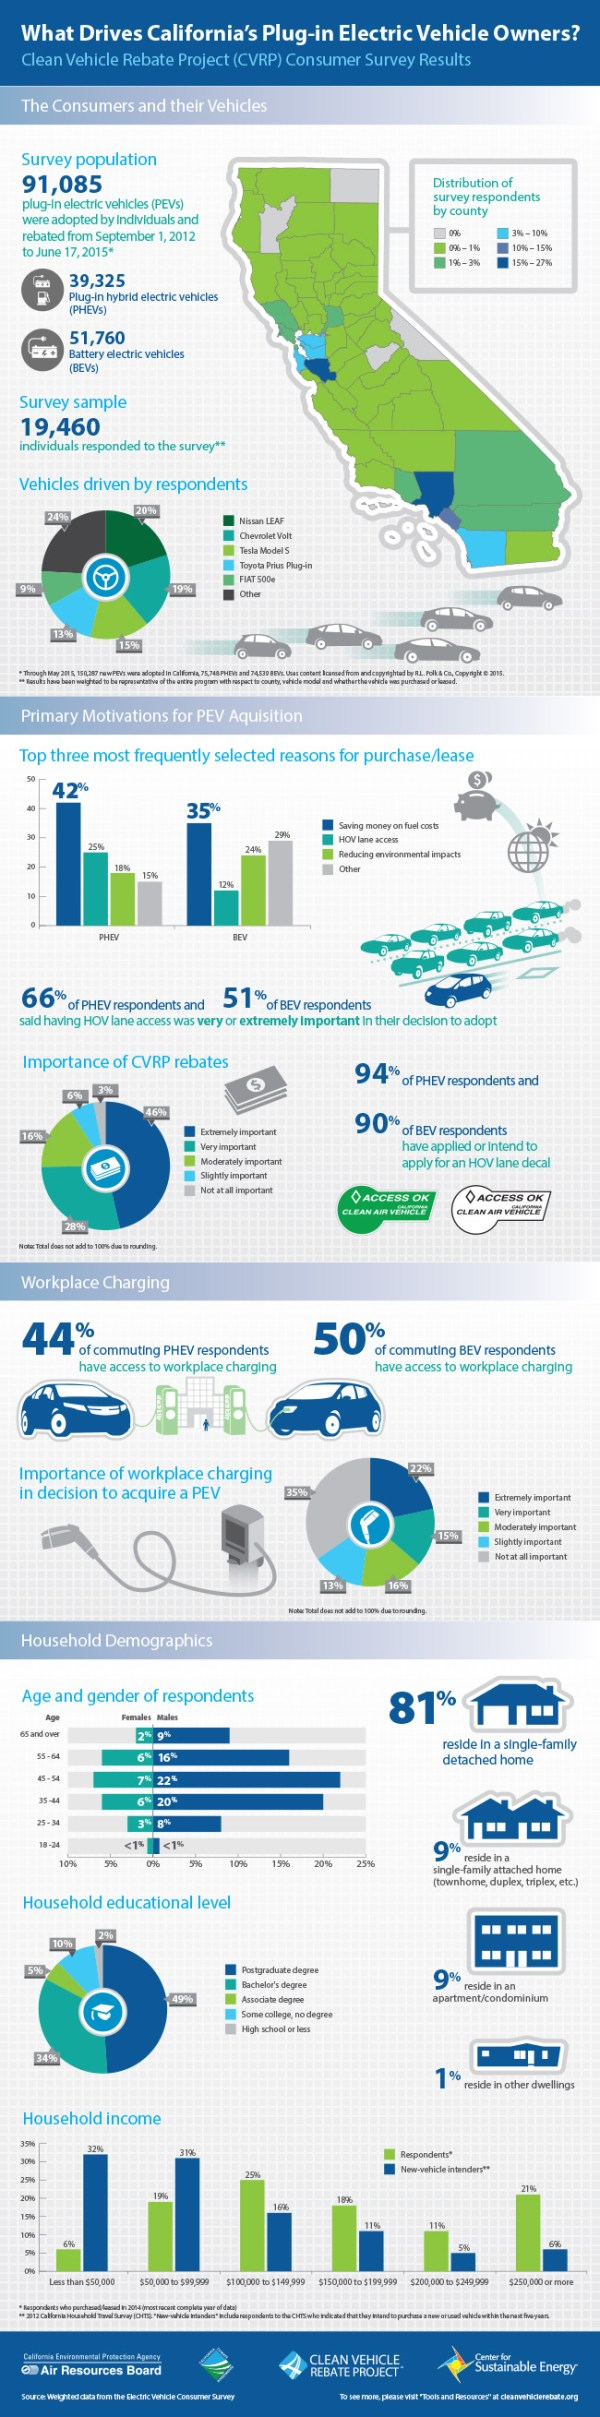 Cvrp Rebate Statistics Clean Vehicle Rebate Project ...